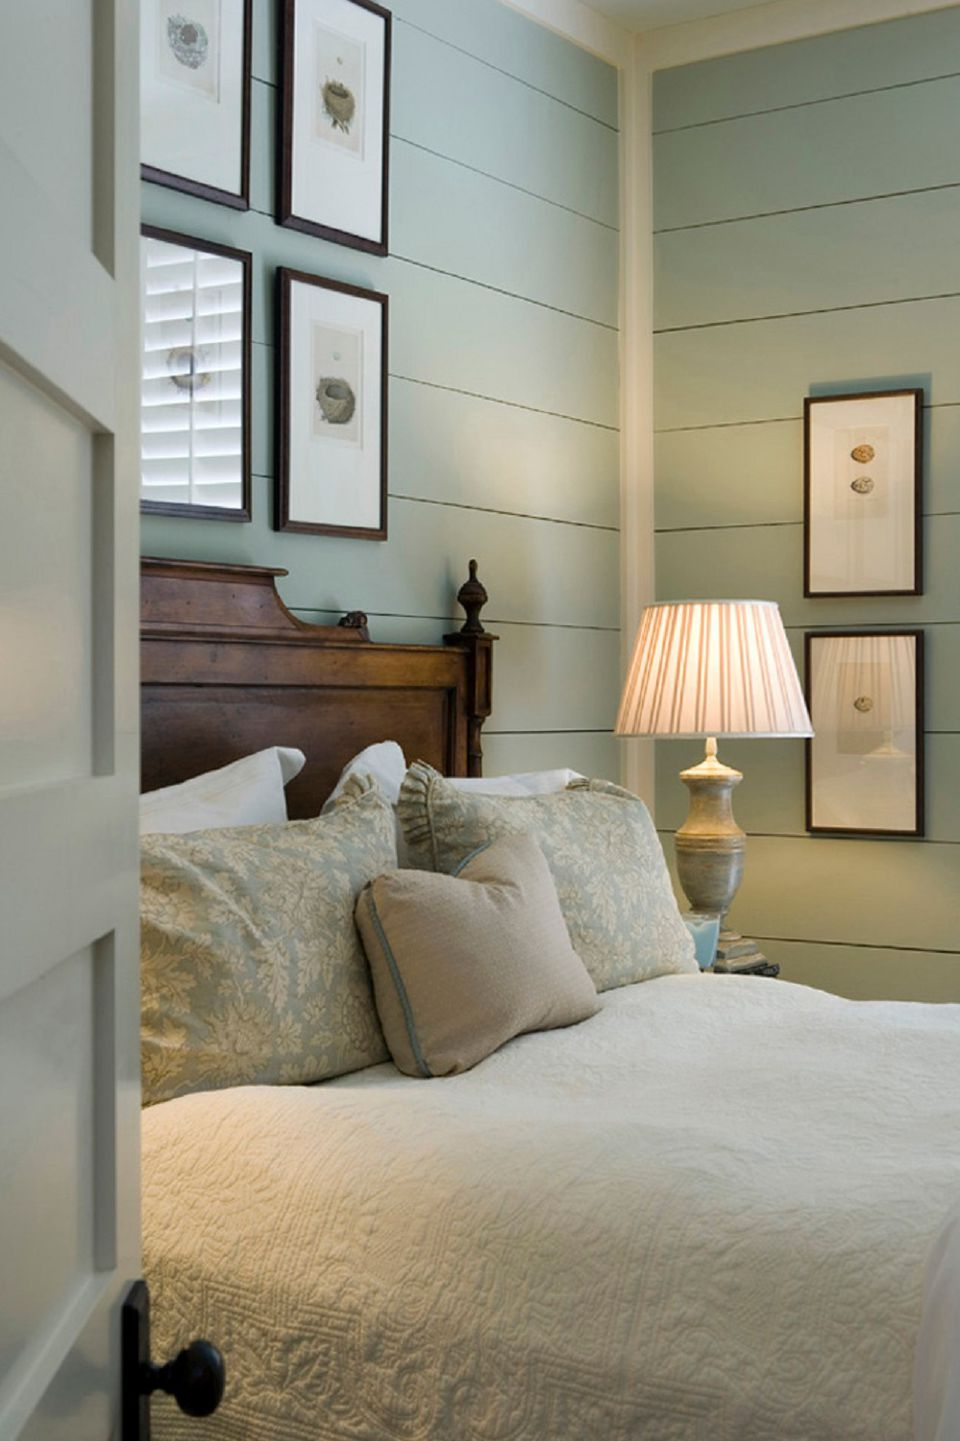 Bedroom with shiplap walls. Farmhouse Style Bedroom Ideas